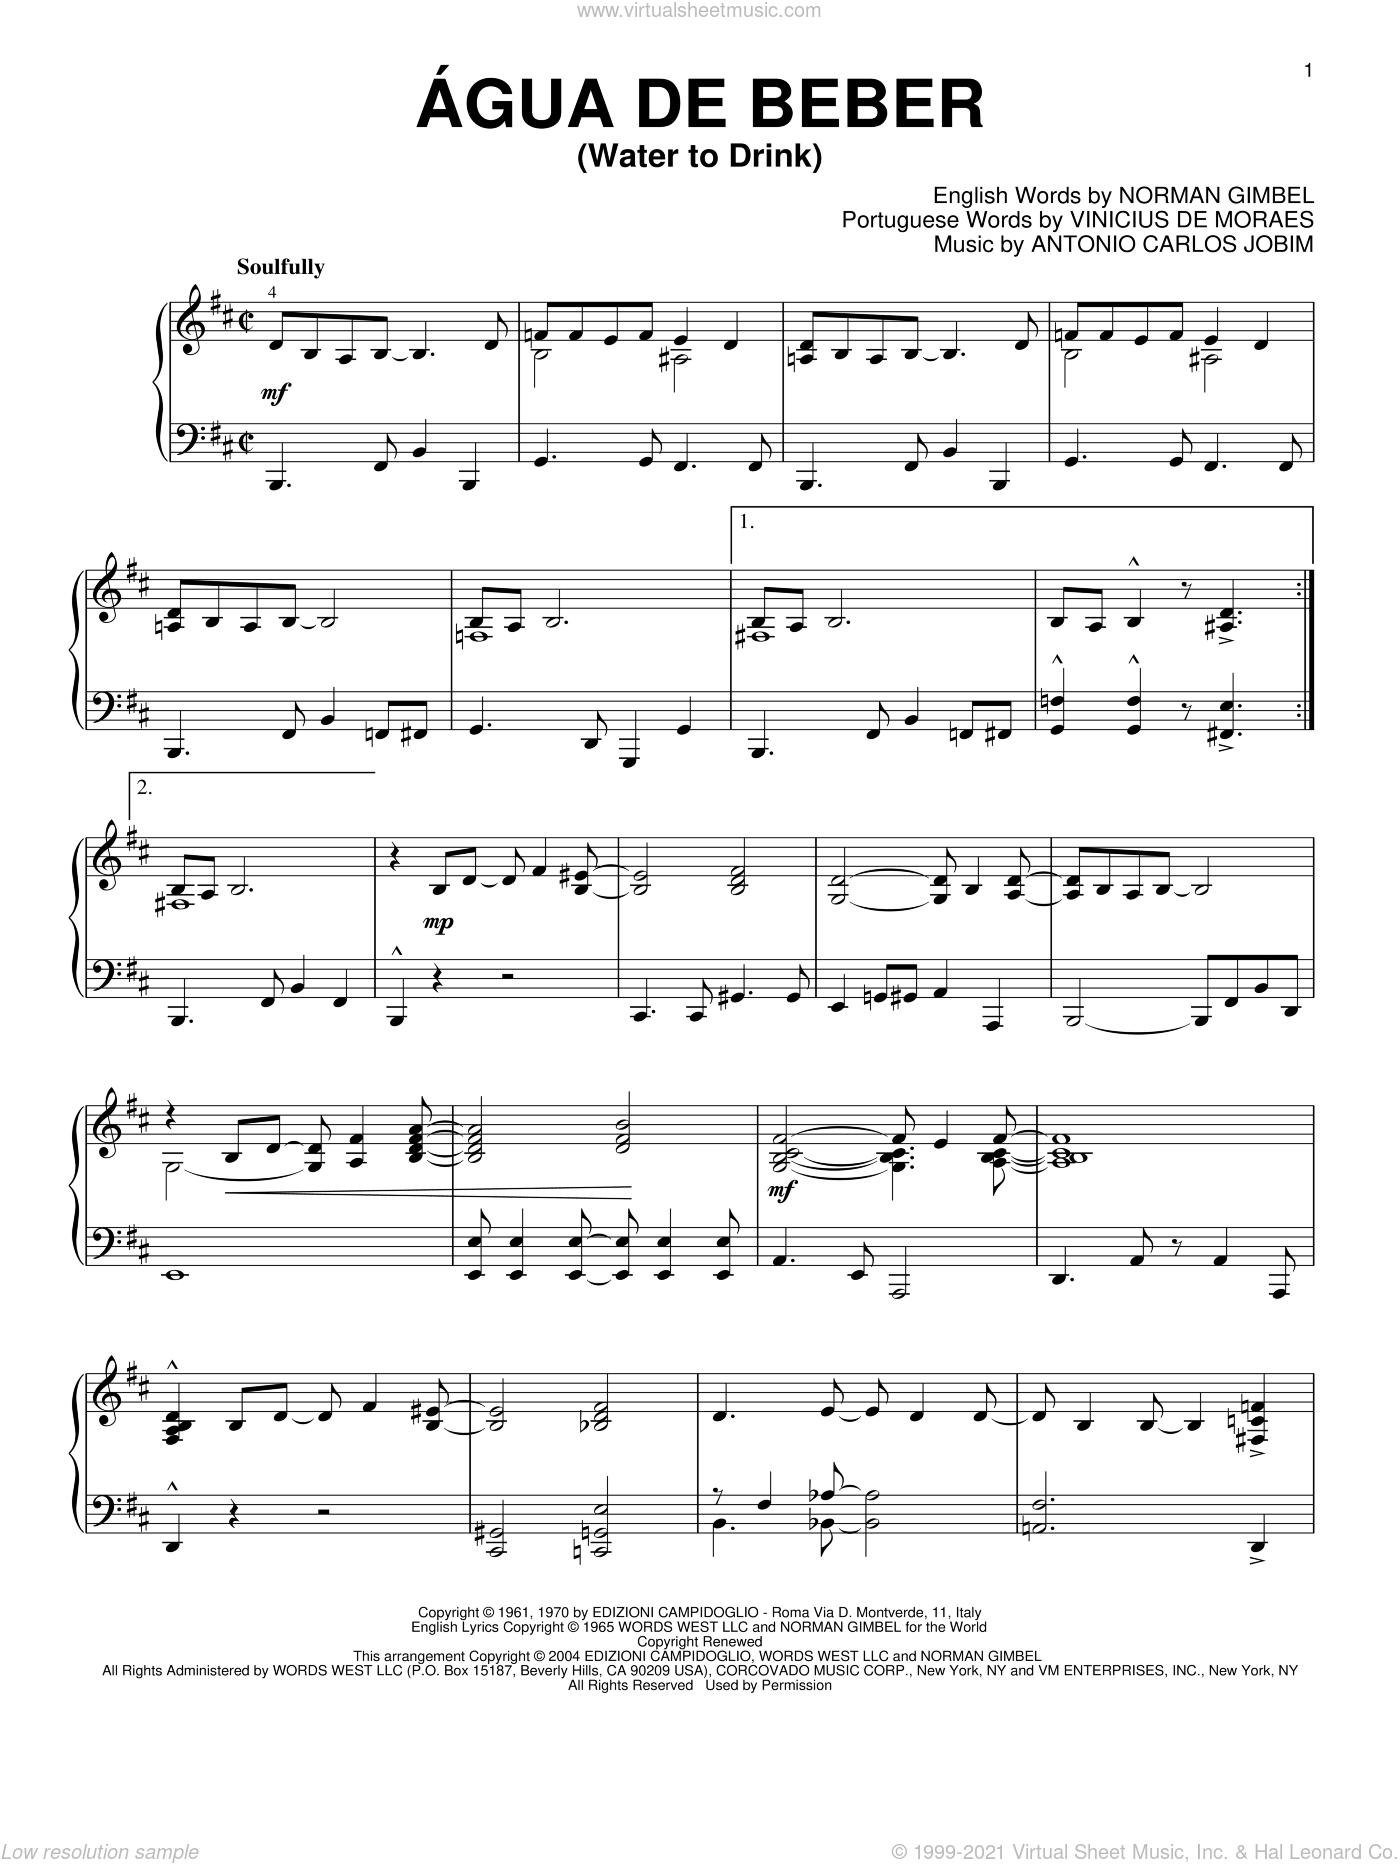 Agua De Beber (Water To Drink) sheet music for piano solo by Antonio Carlos Jobim, Vinicius de Moraes and Norman Gimbel, intermediate skill level